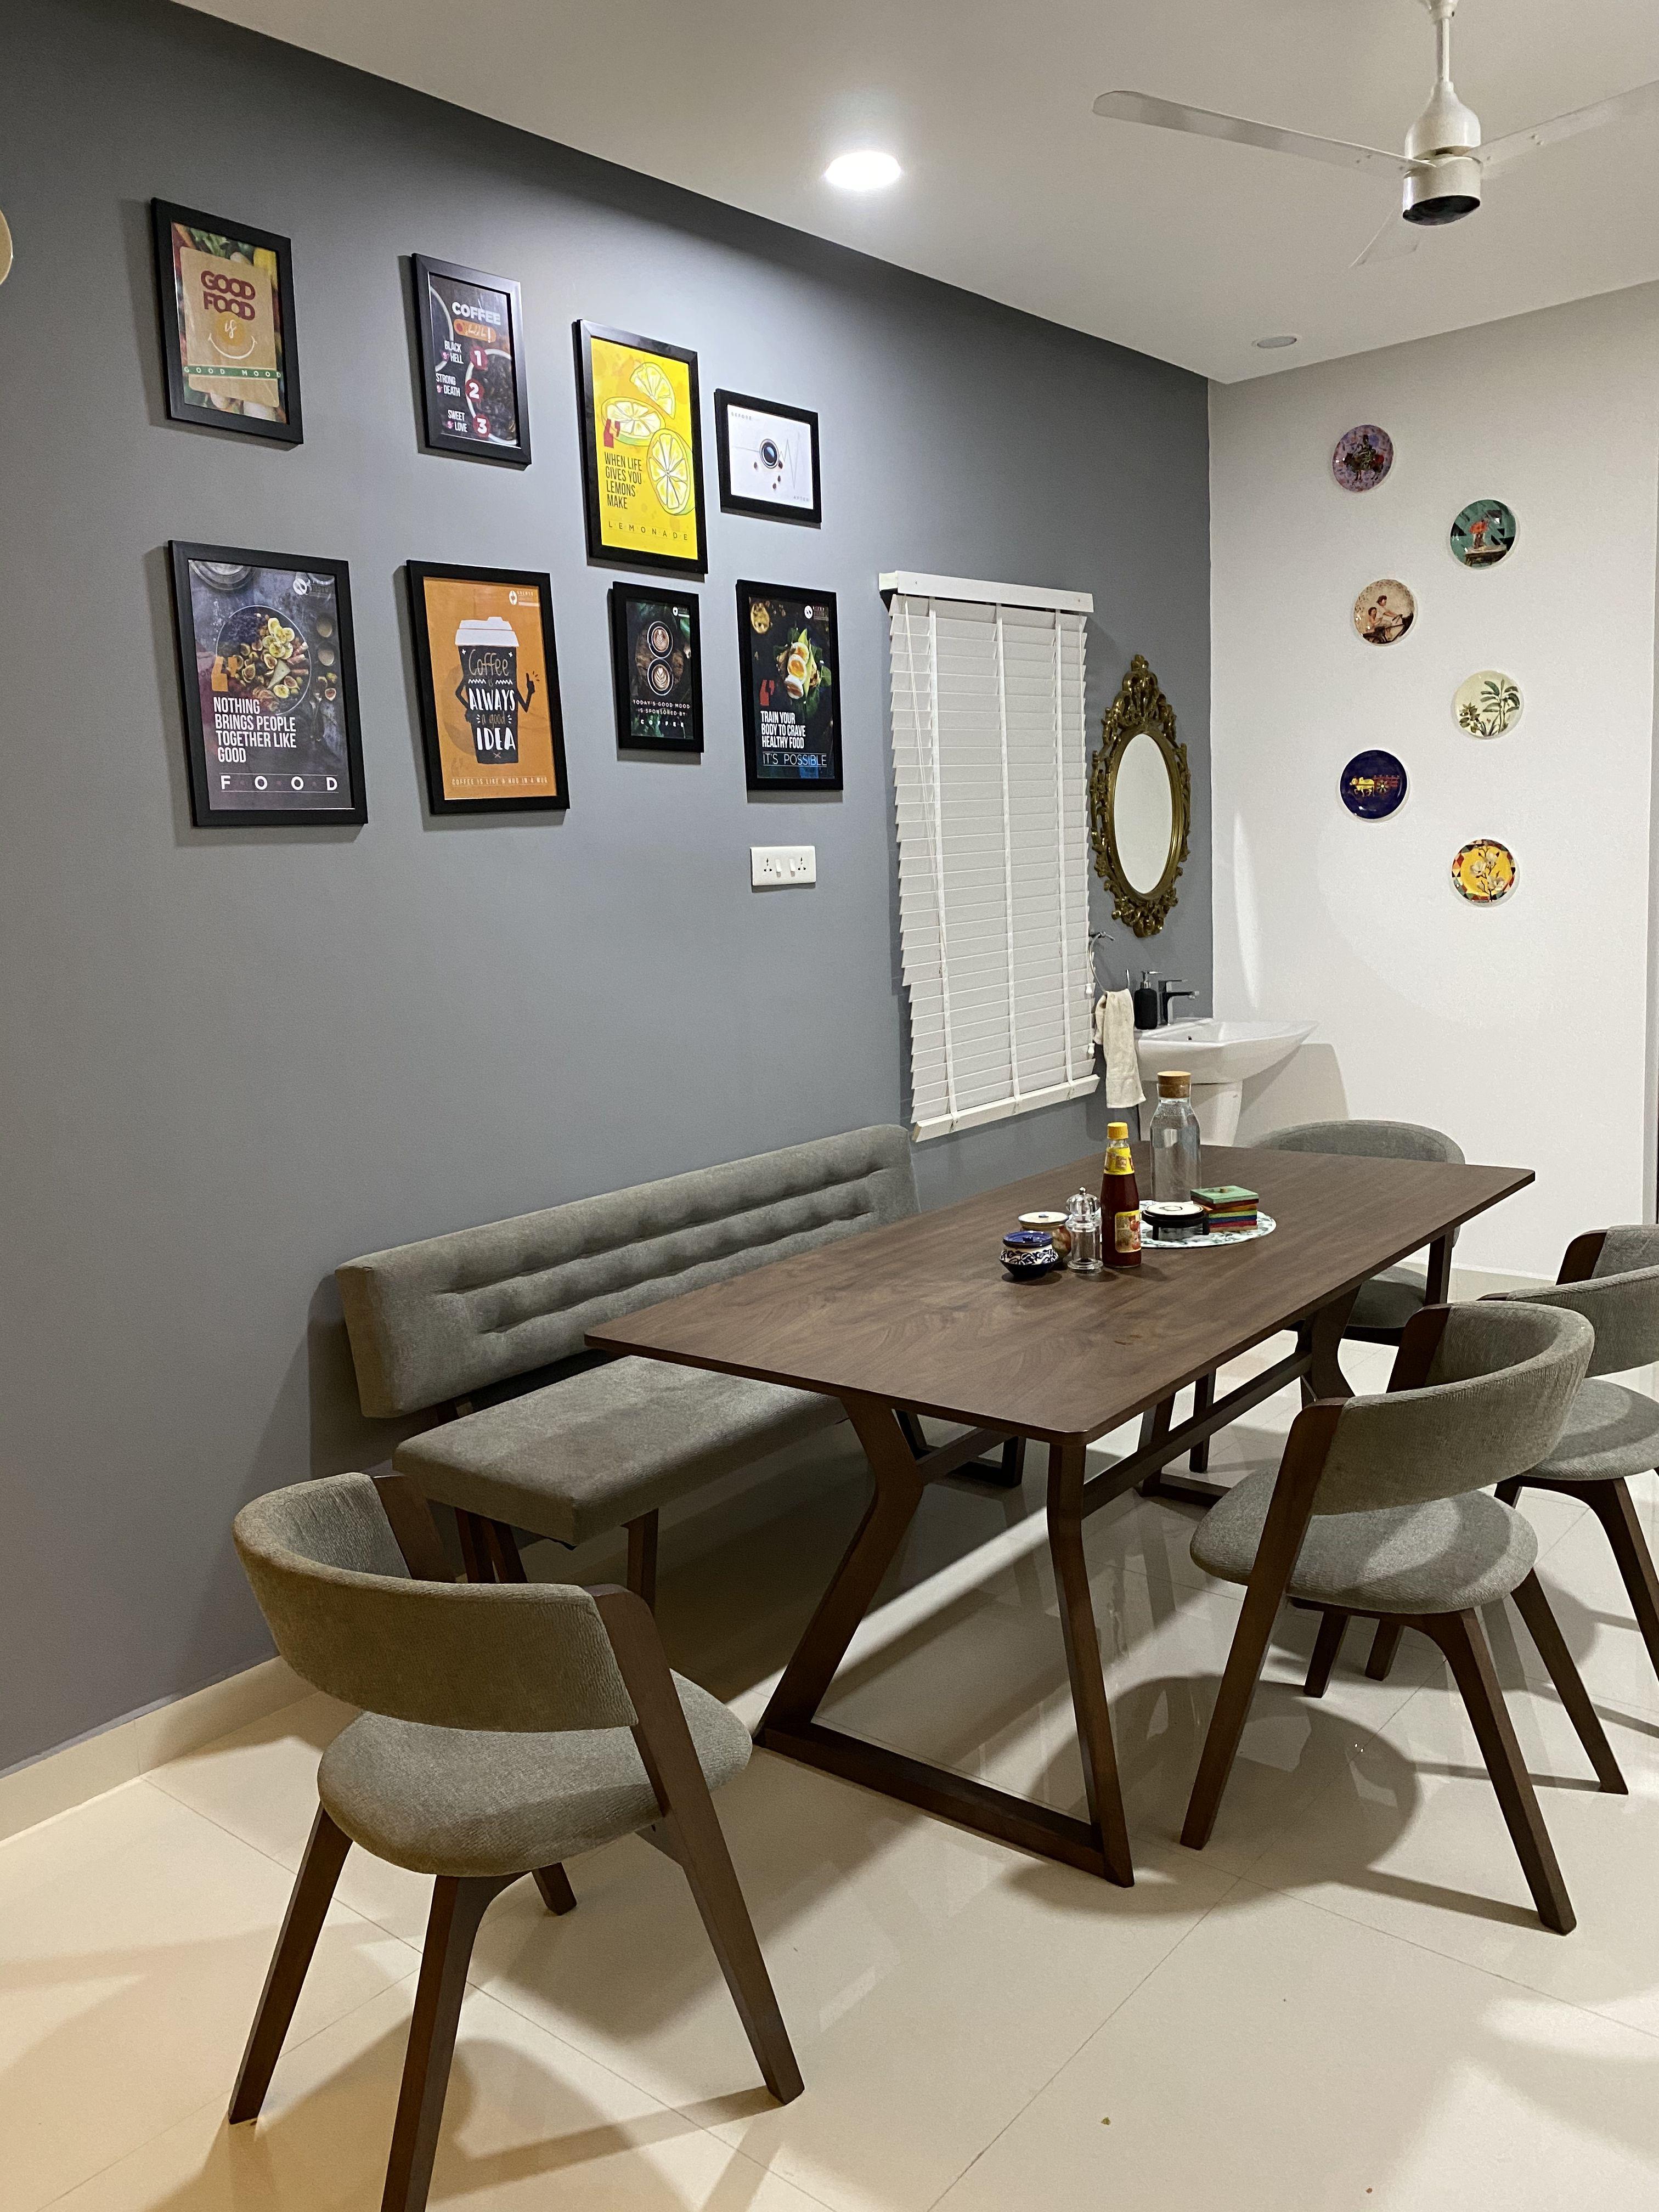 #diningroomideas #beforeandafter #diningroomdecorating #diningroomtable